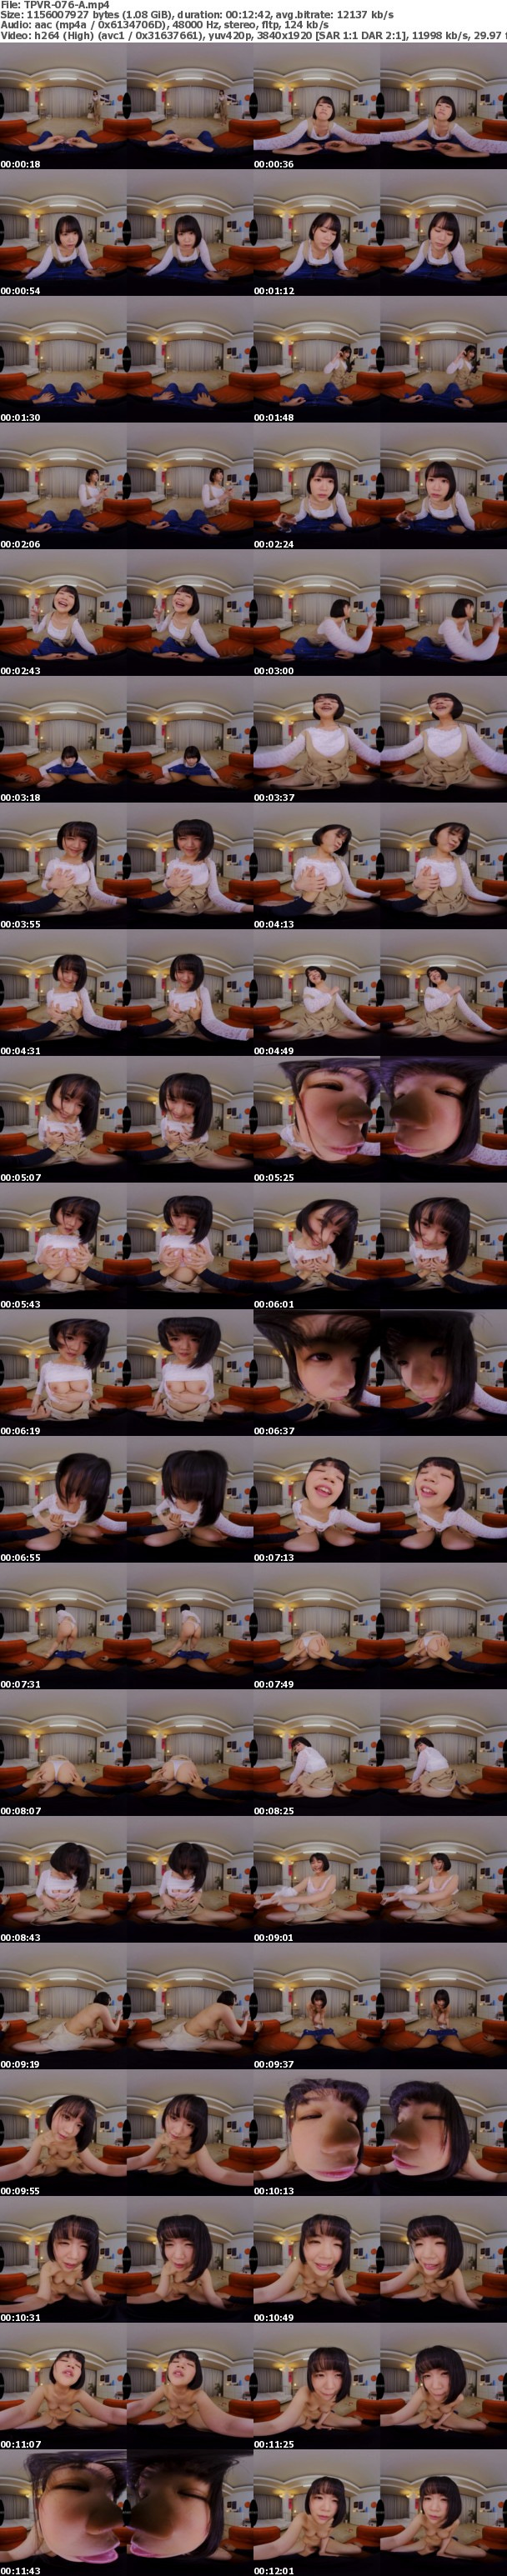 (VR) TPVR-076 高画質 鈴森ひなた Gカップ酔っ払ったツンデレ巨乳姉に逆夜這いされる!「見たい?おっぱい見たい?…うぅぅ…あぁお姉ちゃん舐めるの上手でしょ…うふふ…お姉ちゃんとセックスしようか!」